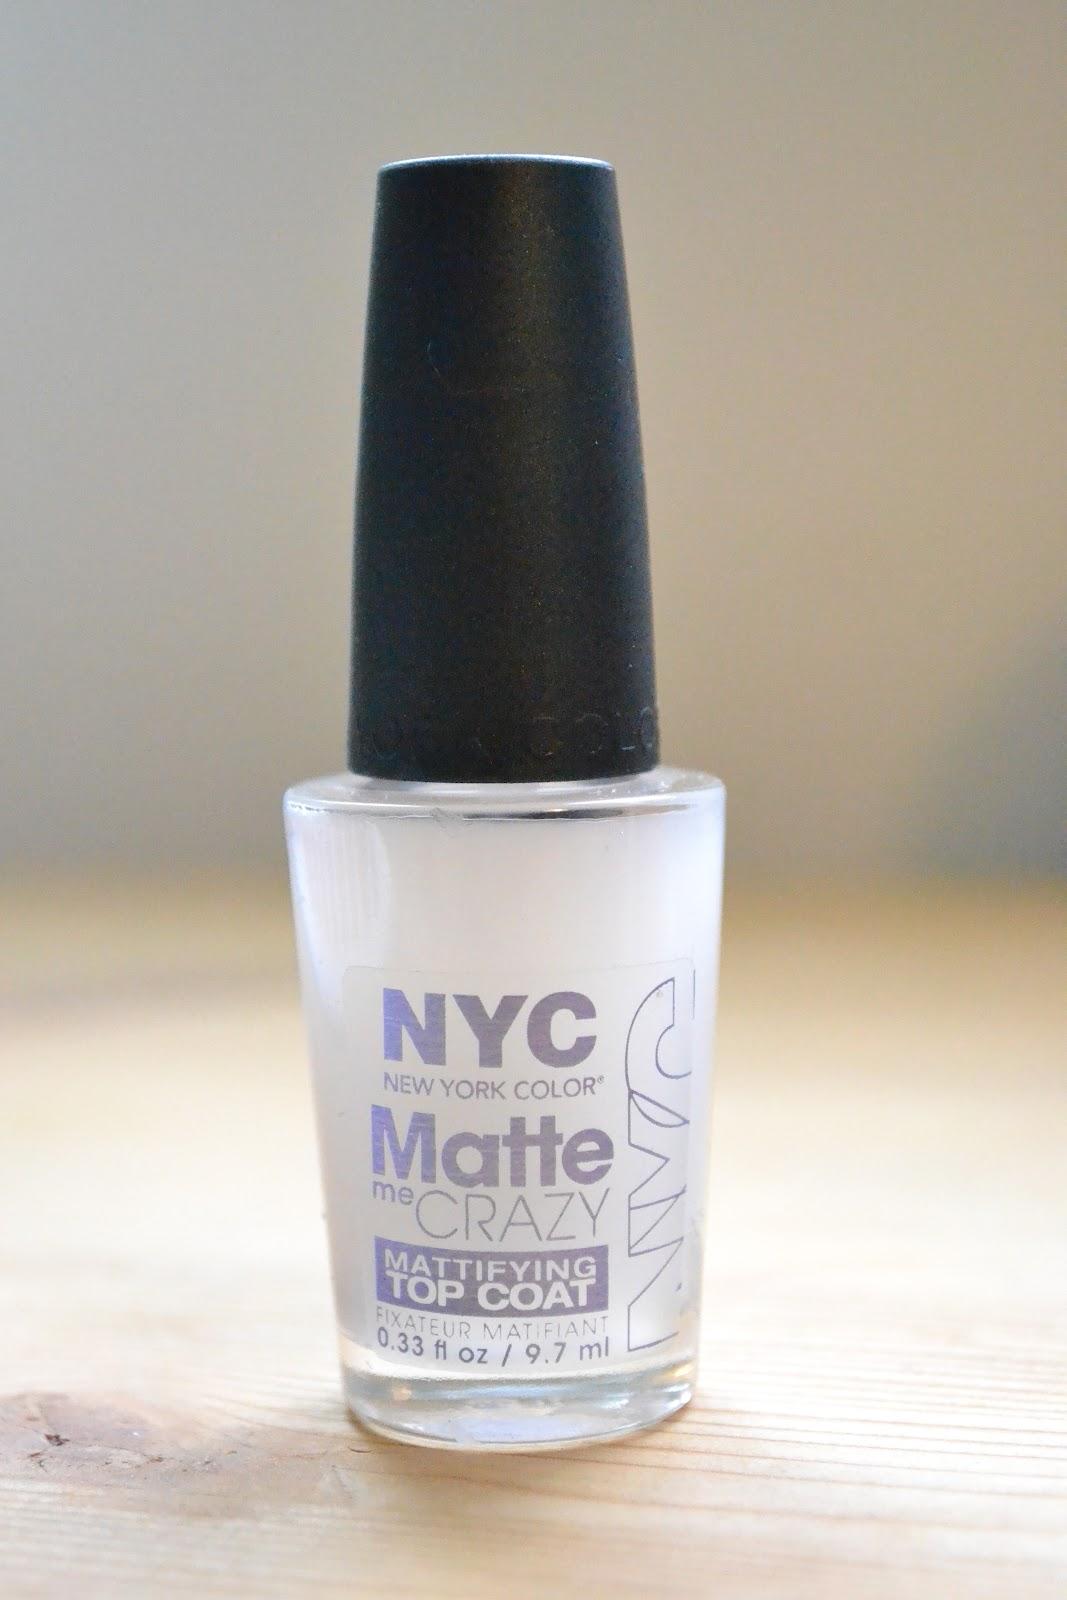 Javiera Valentina (Makeup blog): Matte Nail polish (NYC Matte Me Crazy)